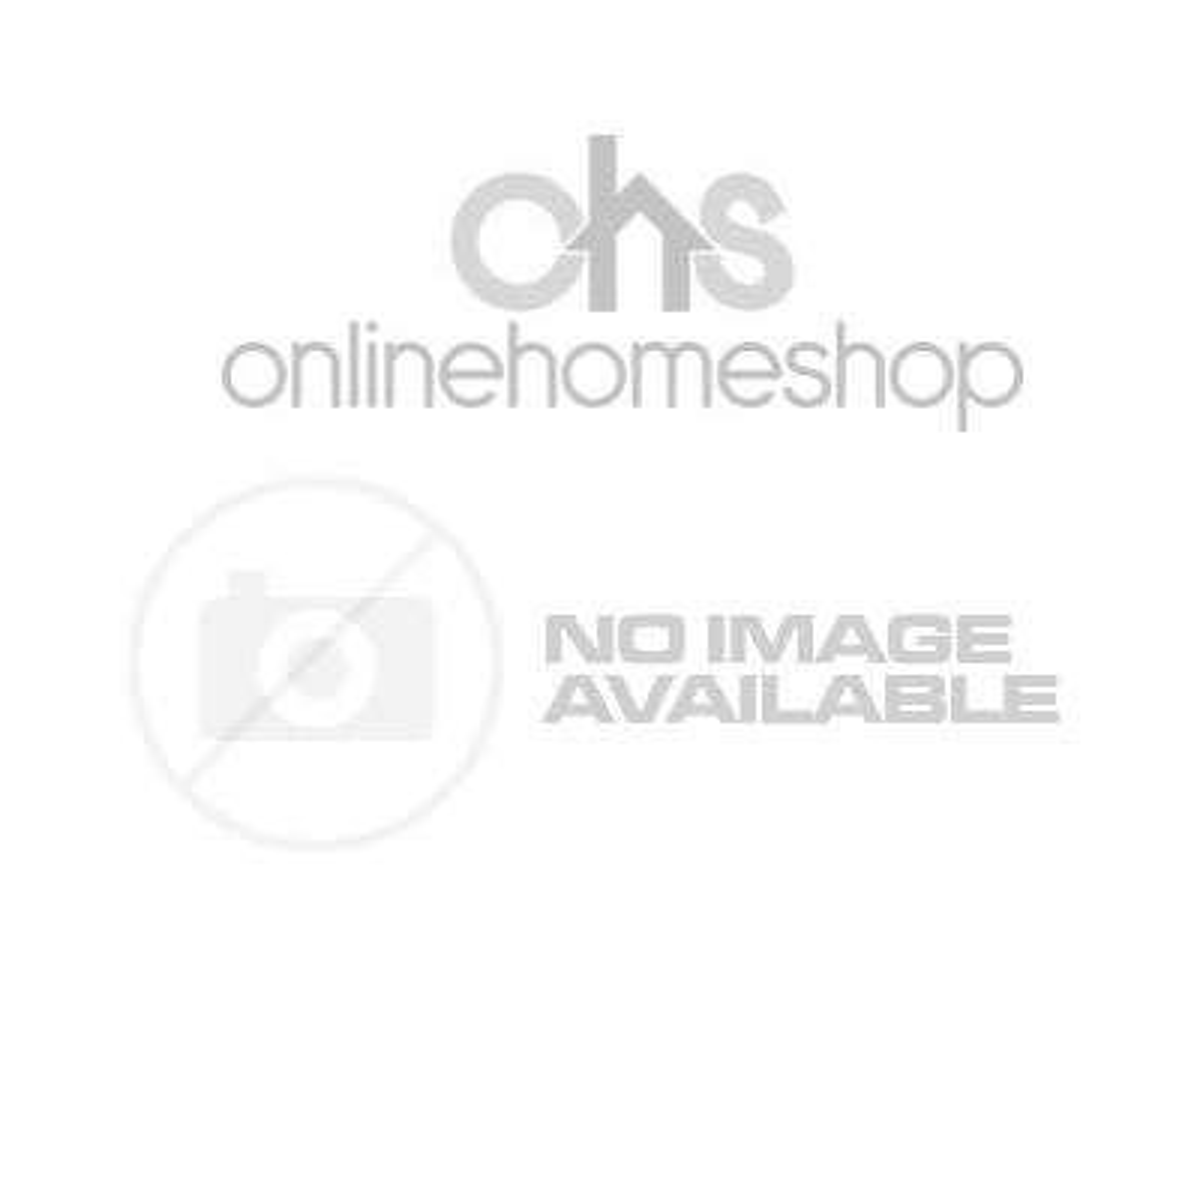 Dreamscene Towel Bale 6 Piece - Charcoal